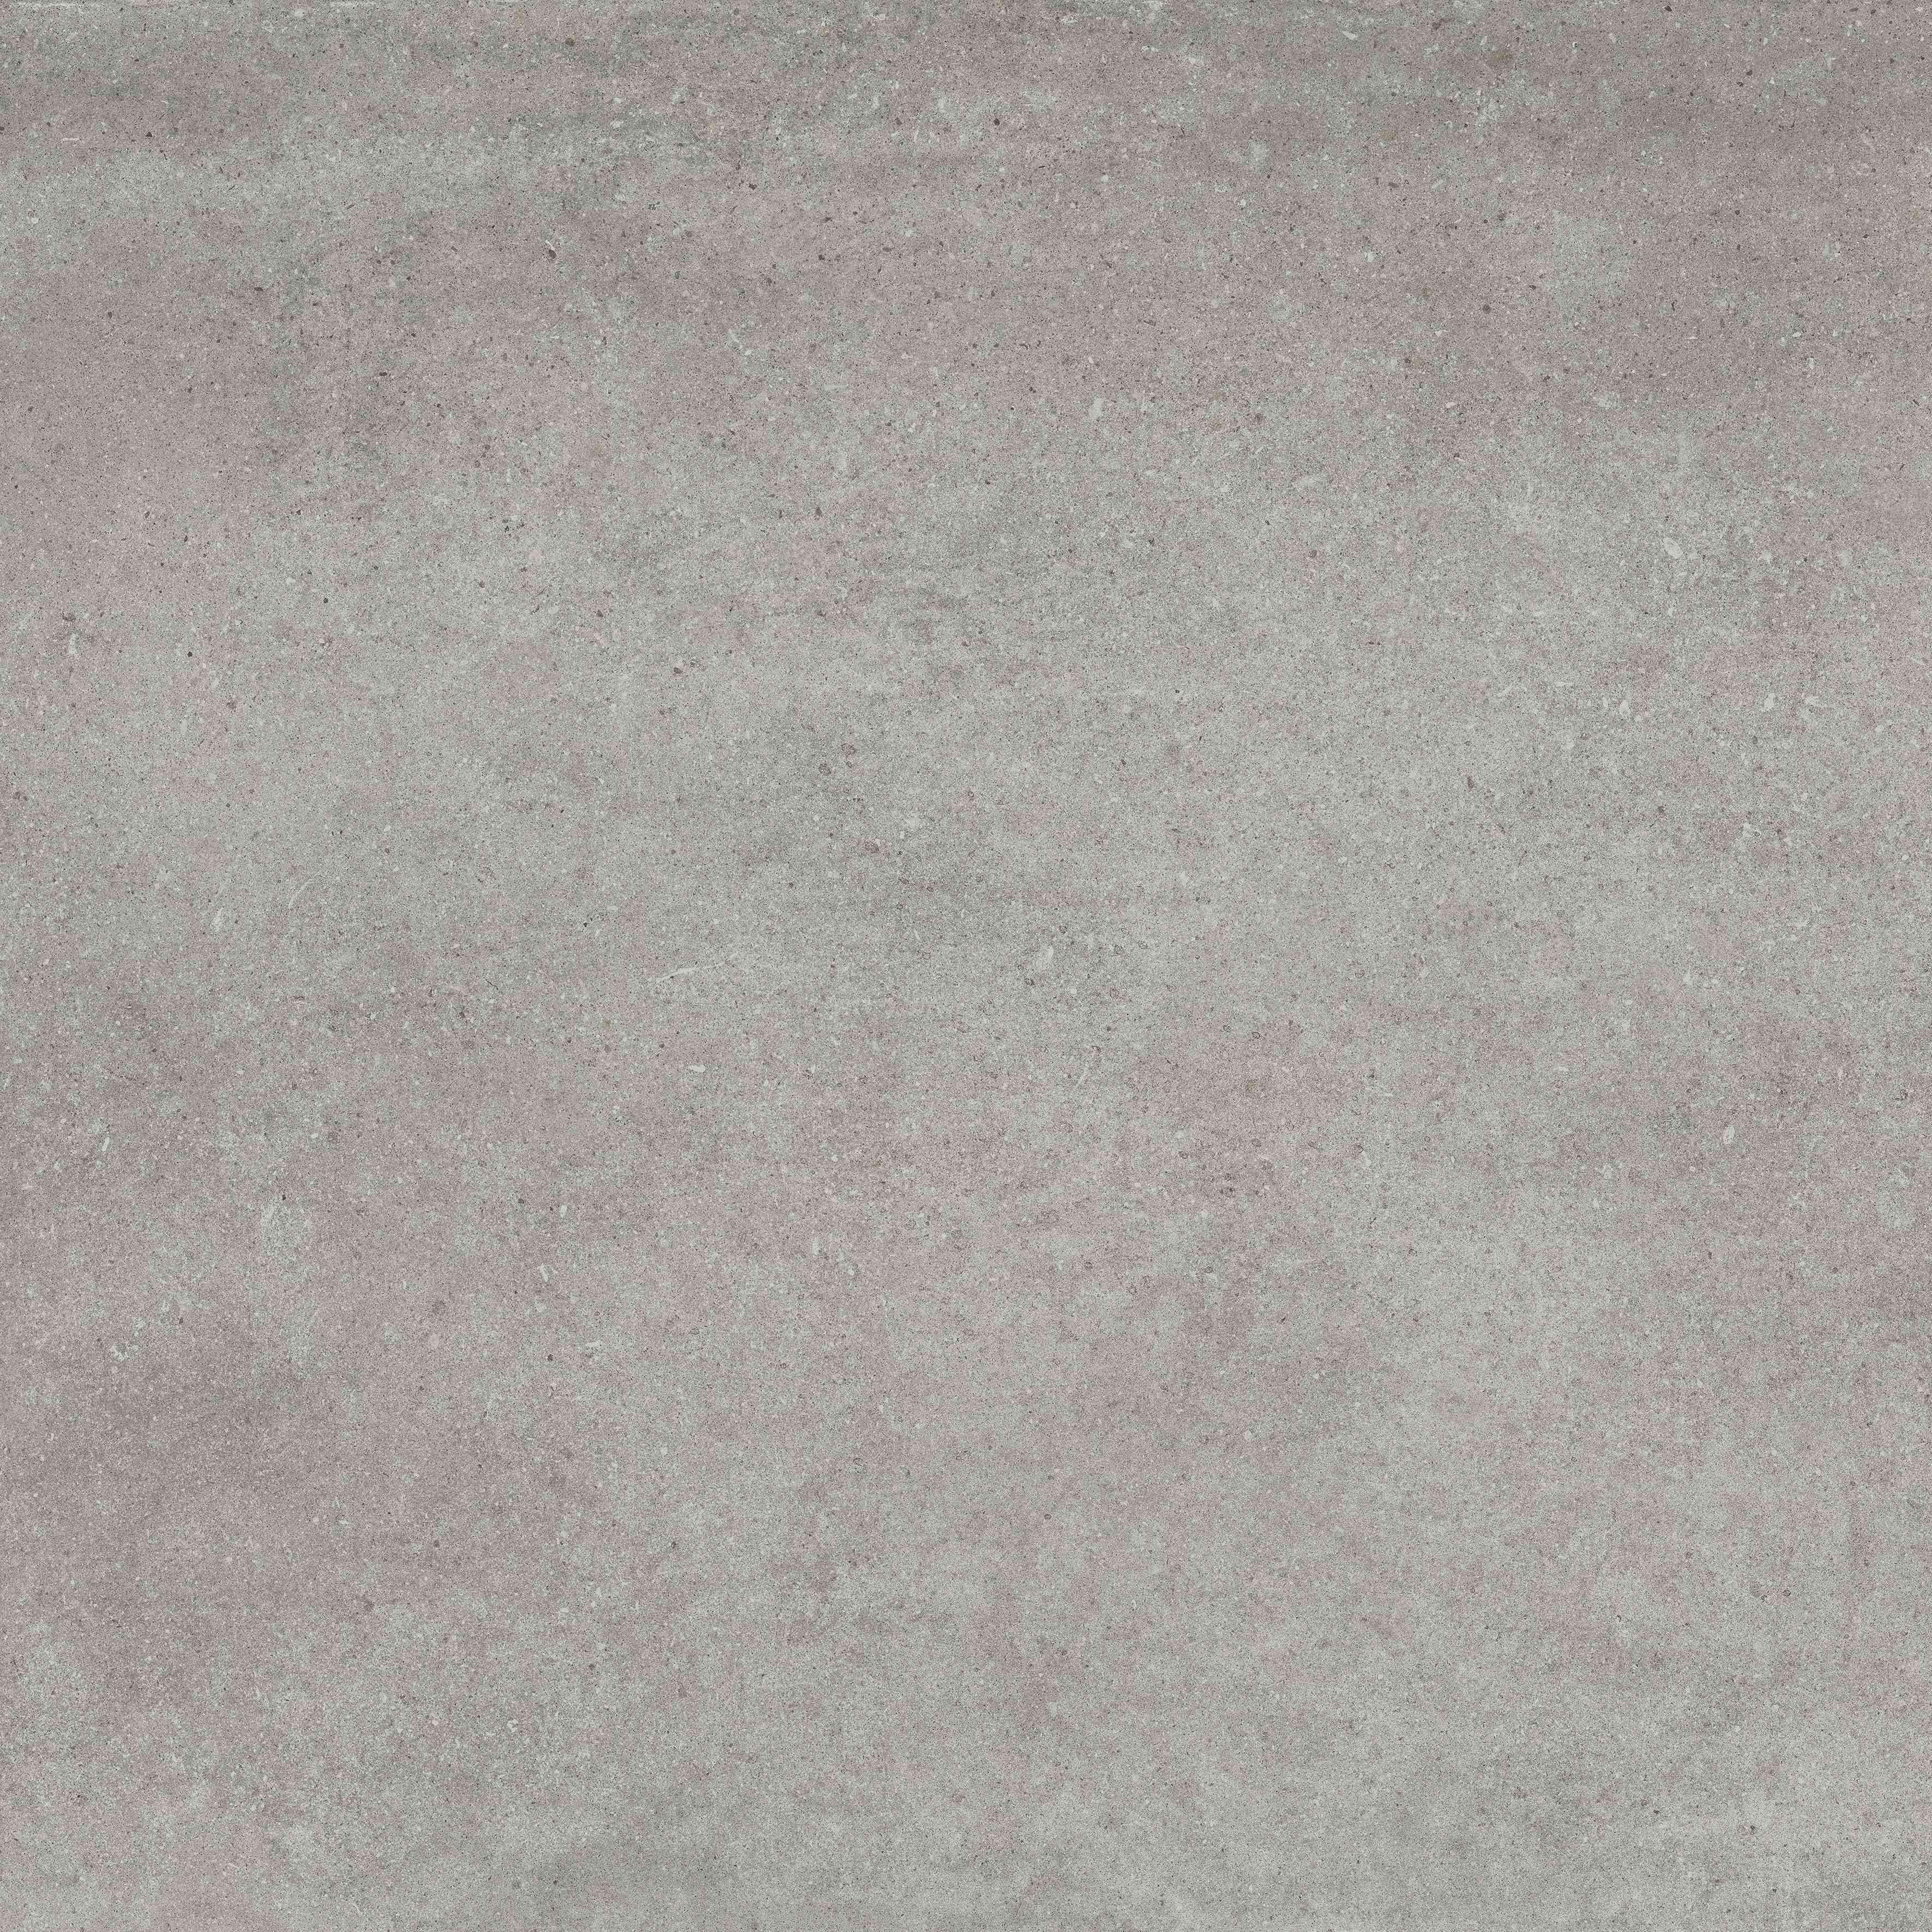 Плитка GRIGIO (ZRXRM8R) изображение 1